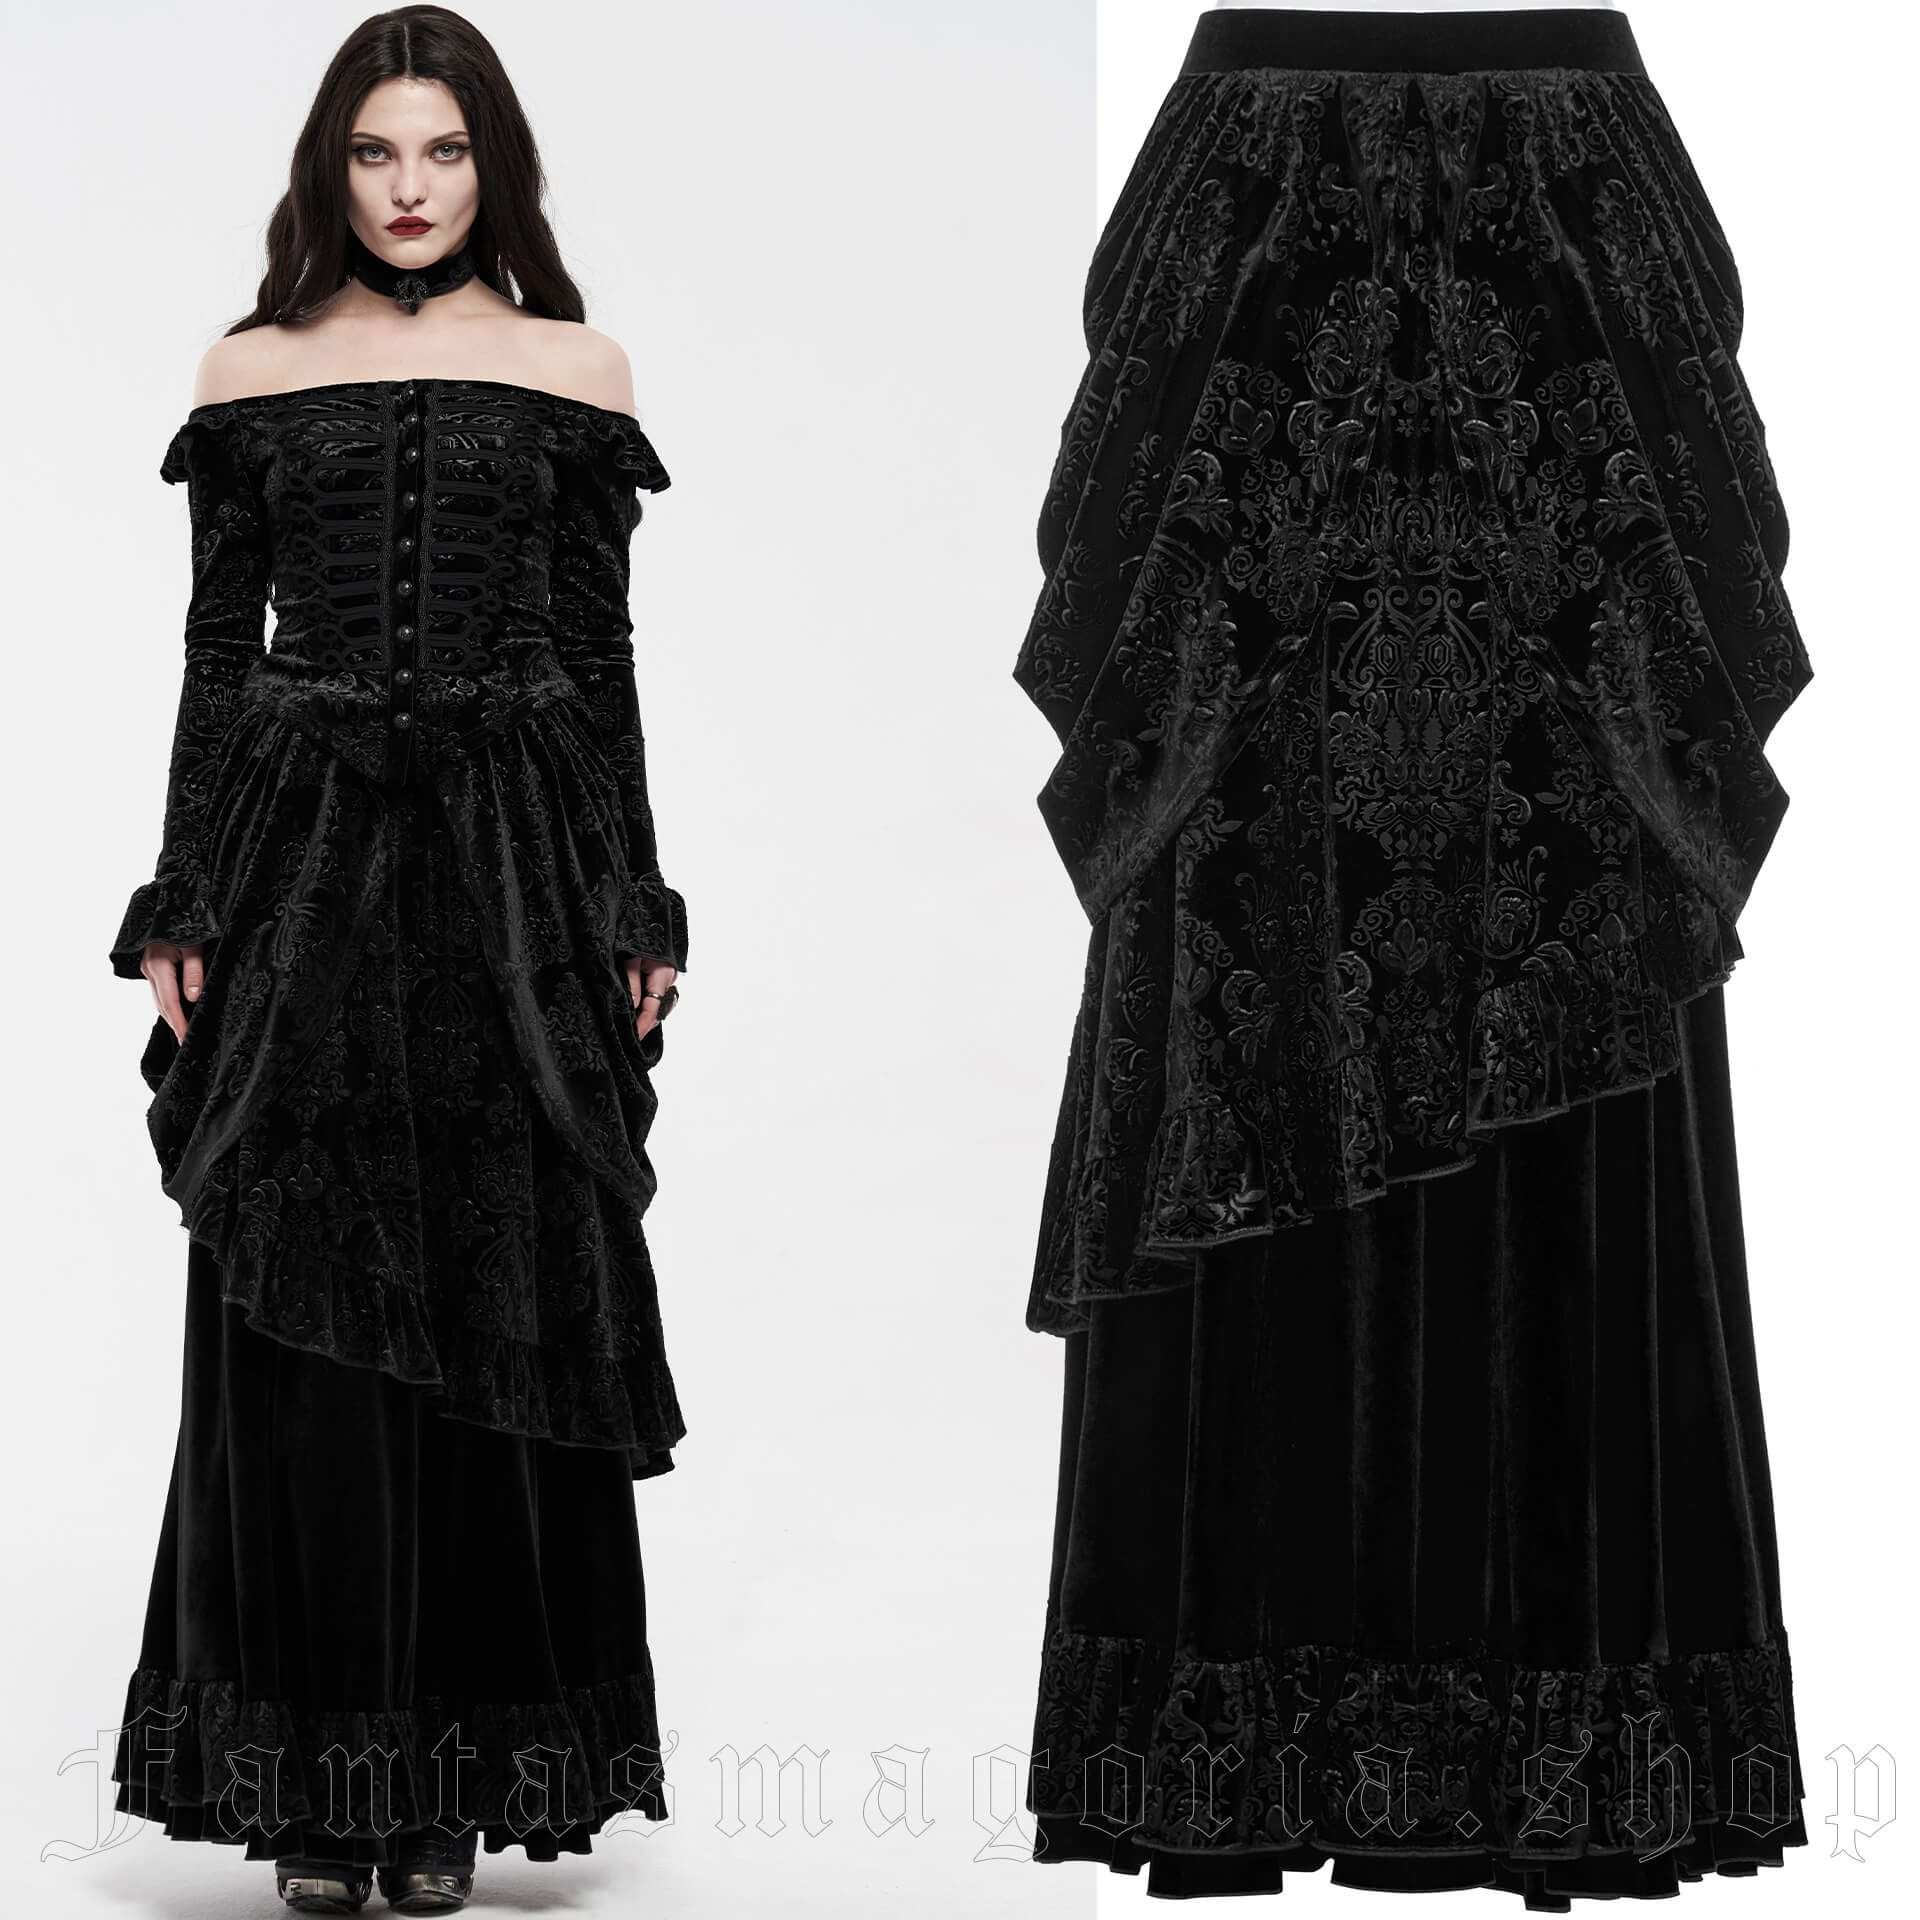 women's Baroness Black Skirt by PUNK RAVE brand, code: WQ-486/BK